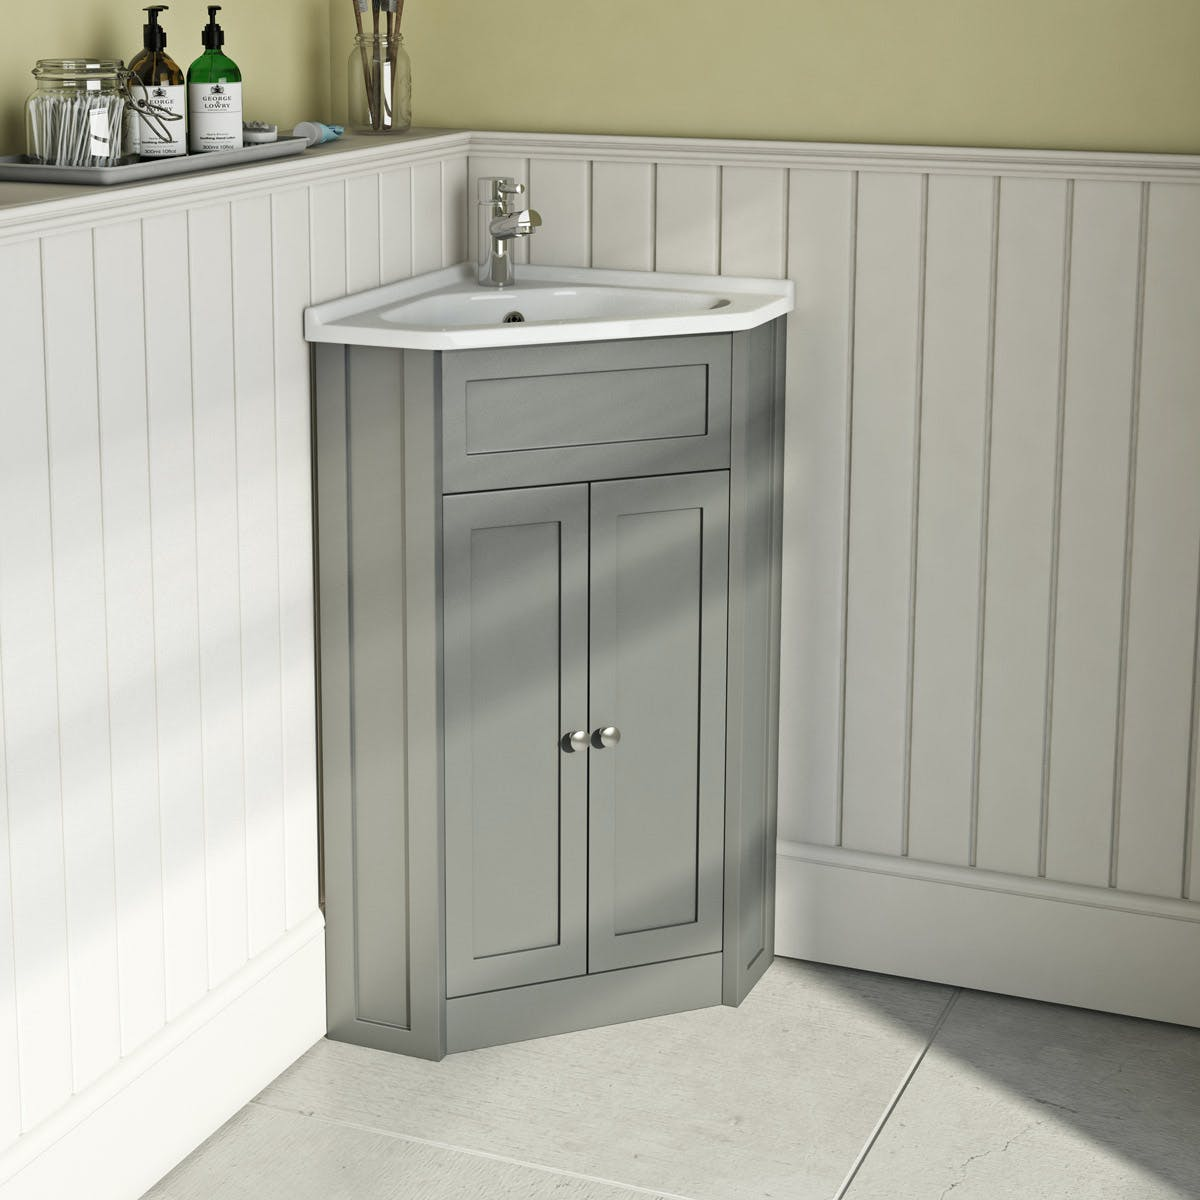 The Bath Co Camberley Satin Grey Corner Floorstanding Vanity Unit And Ceramic Basin 580mm